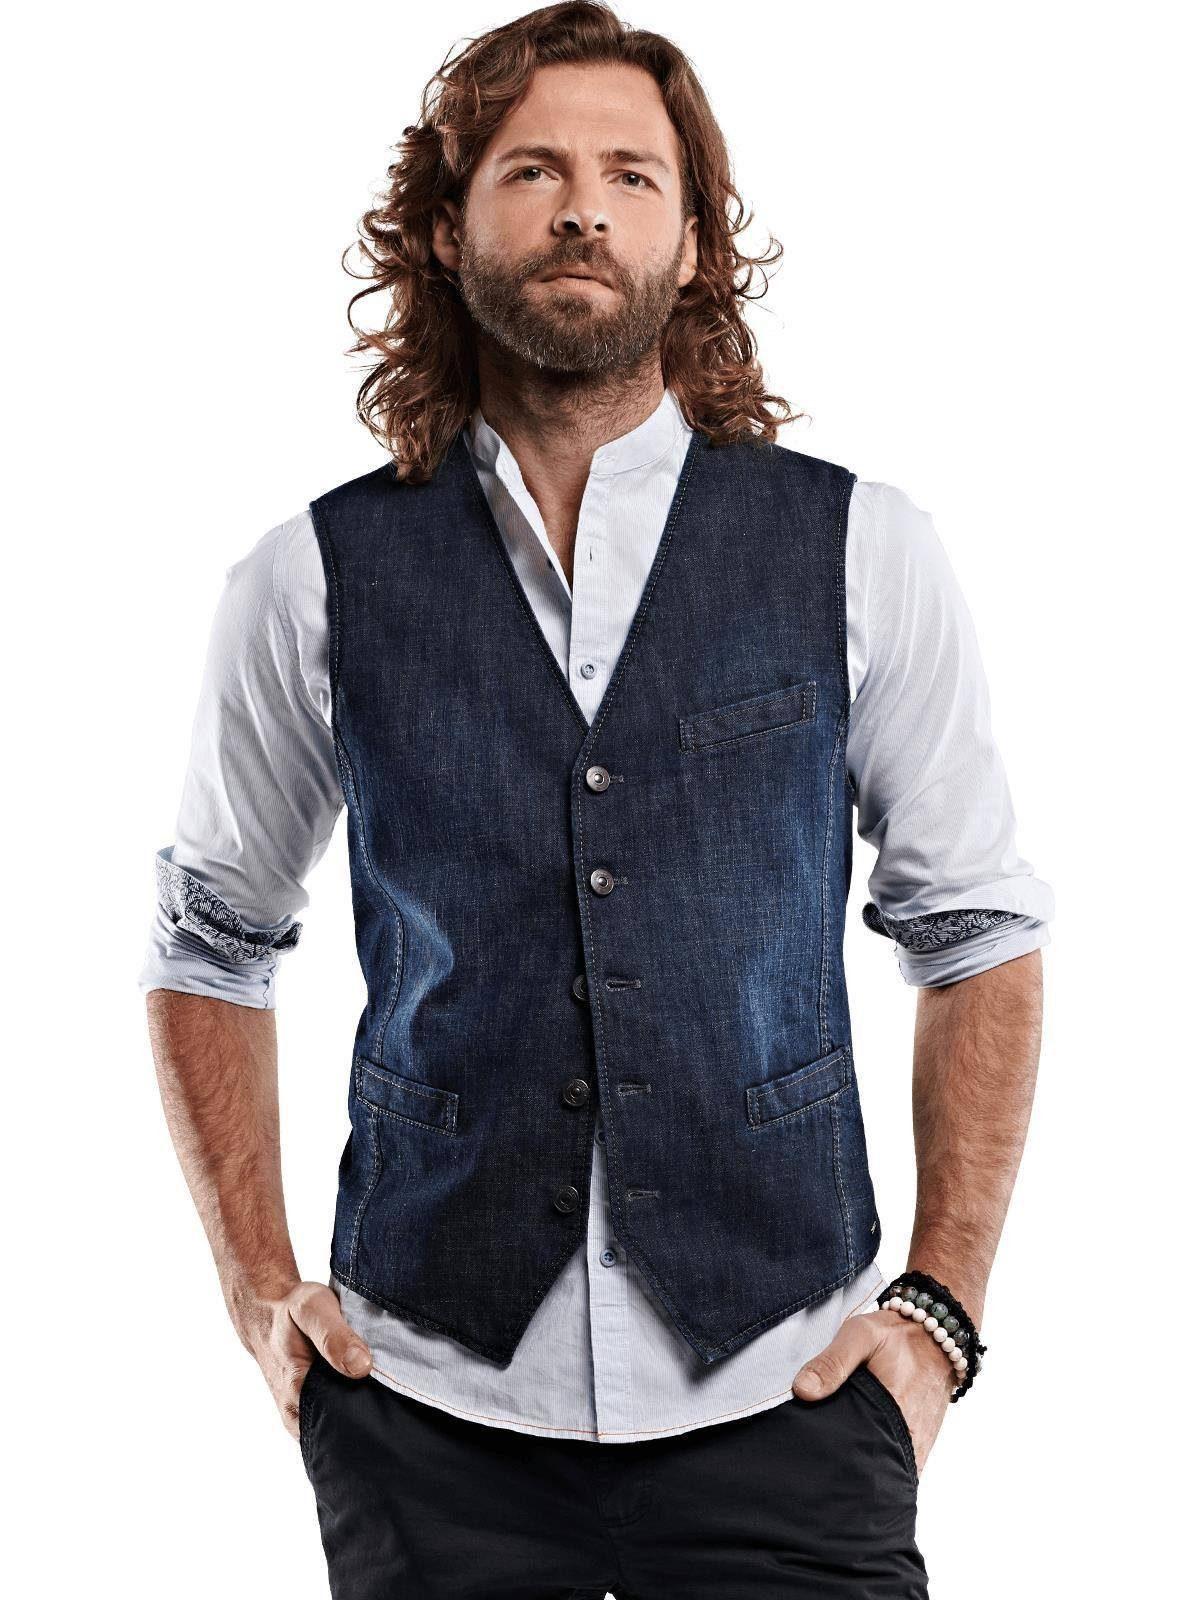 emilio adani Sakko-Weste aus Jeans